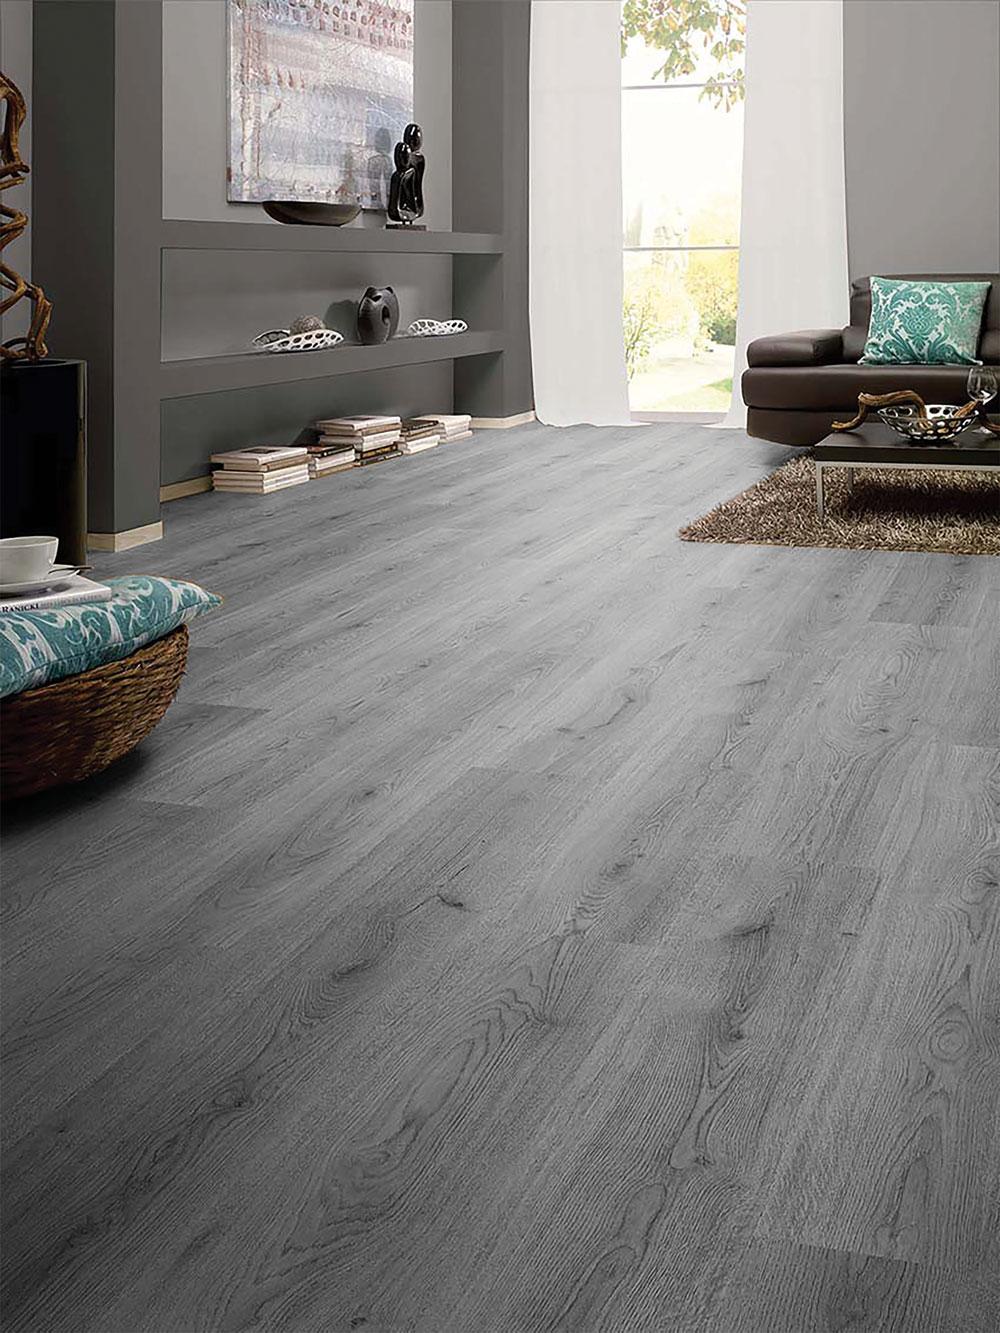 Wood Flooring Tc Matthews